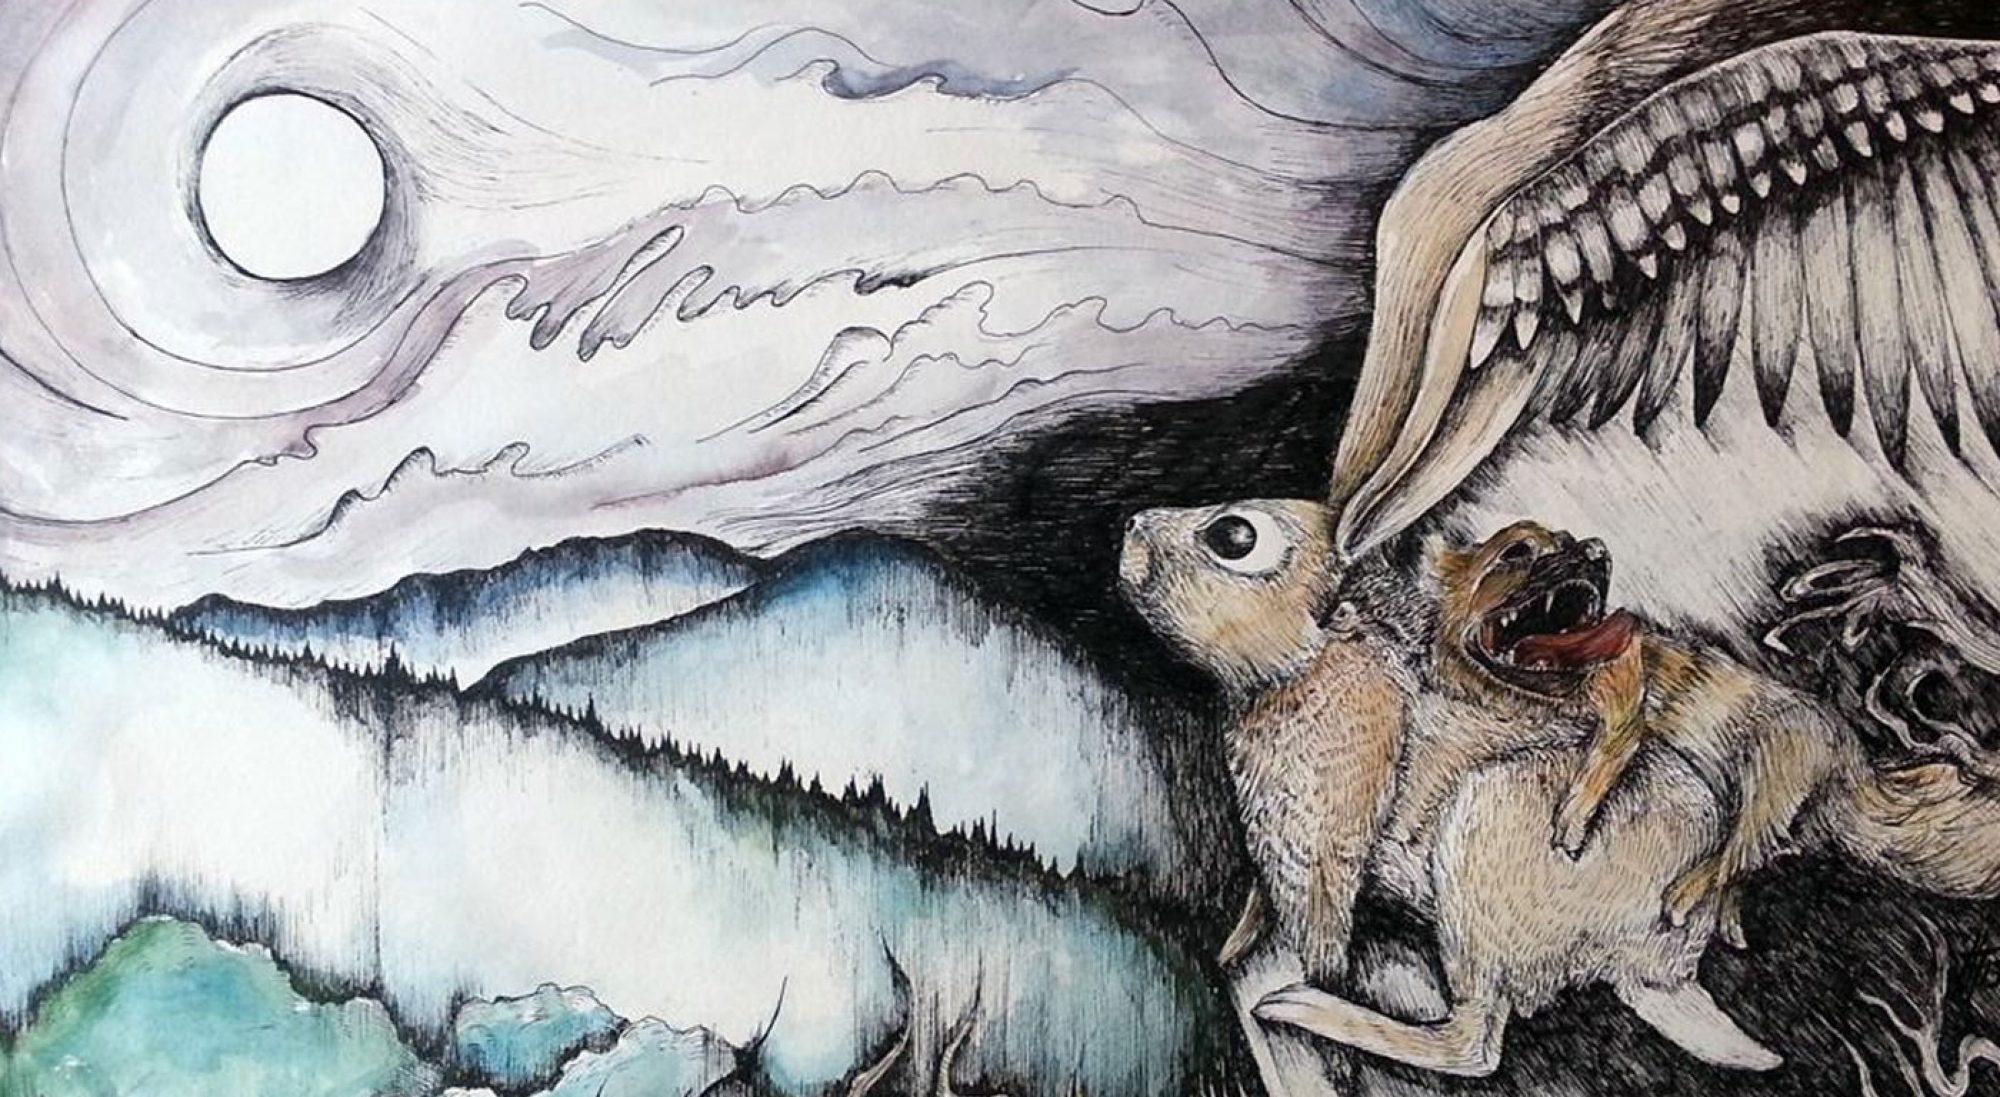 Herr Goat Graphics